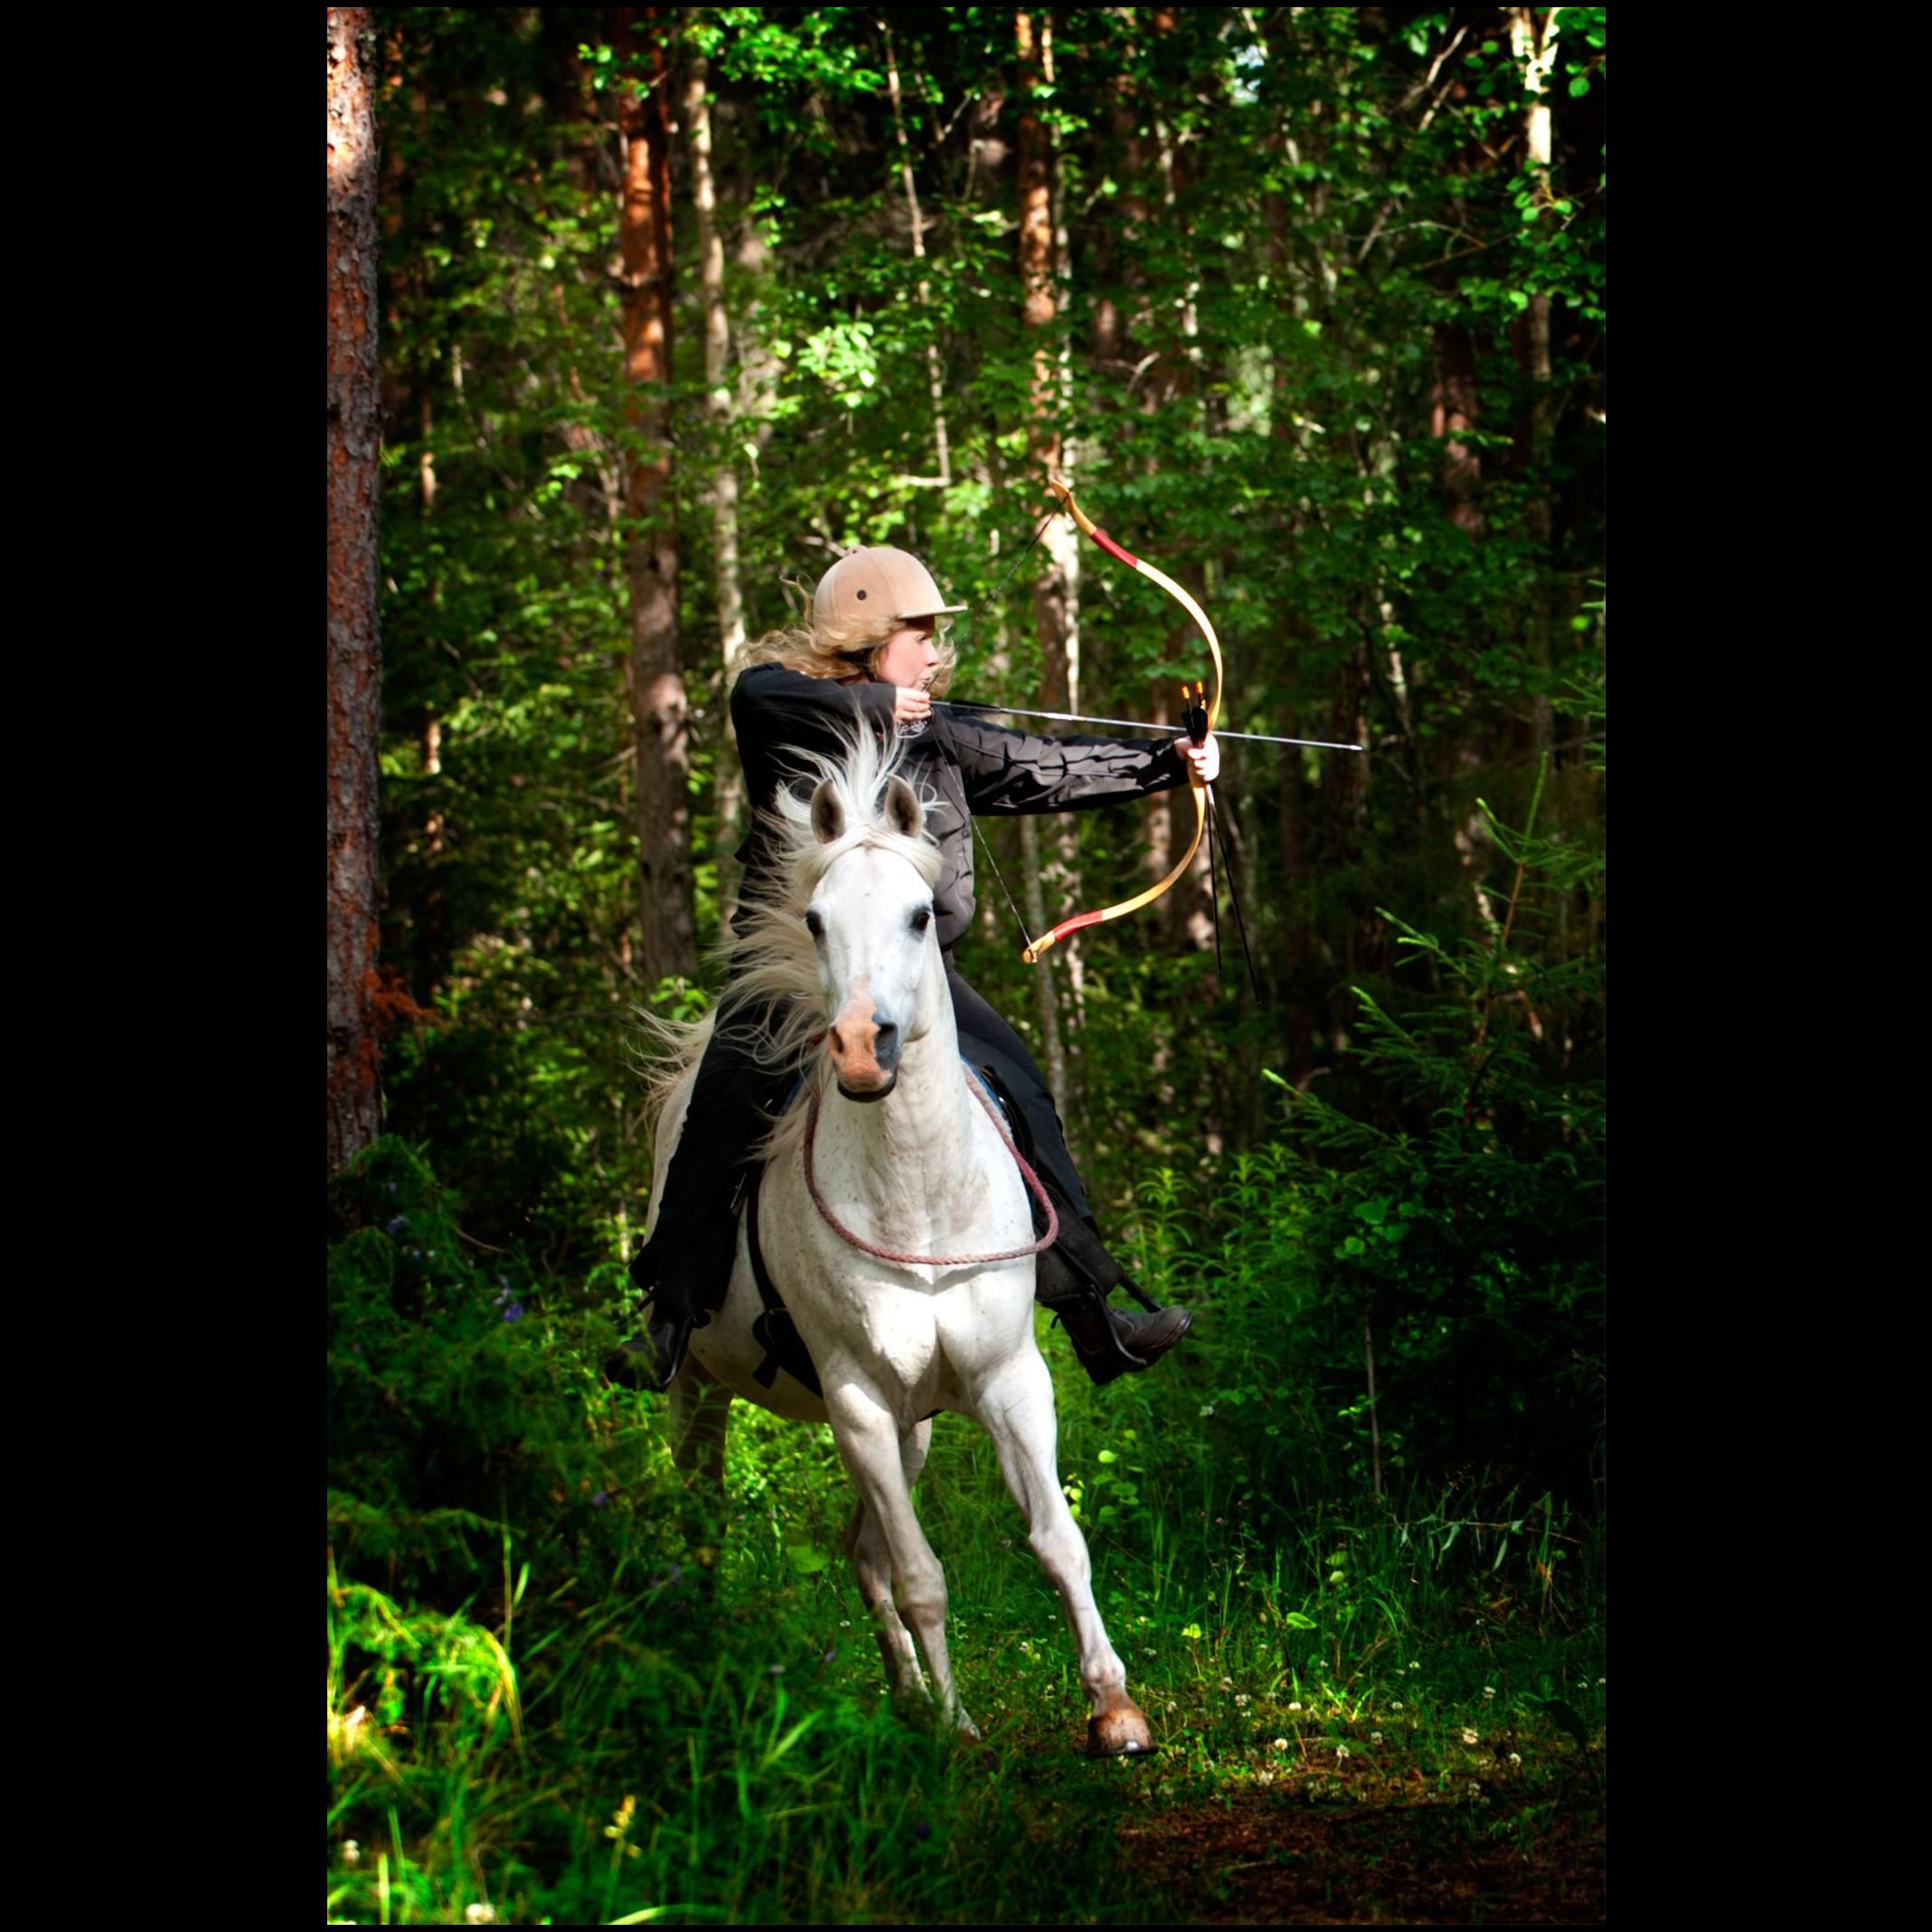 Dalecarlian Horse Adventures